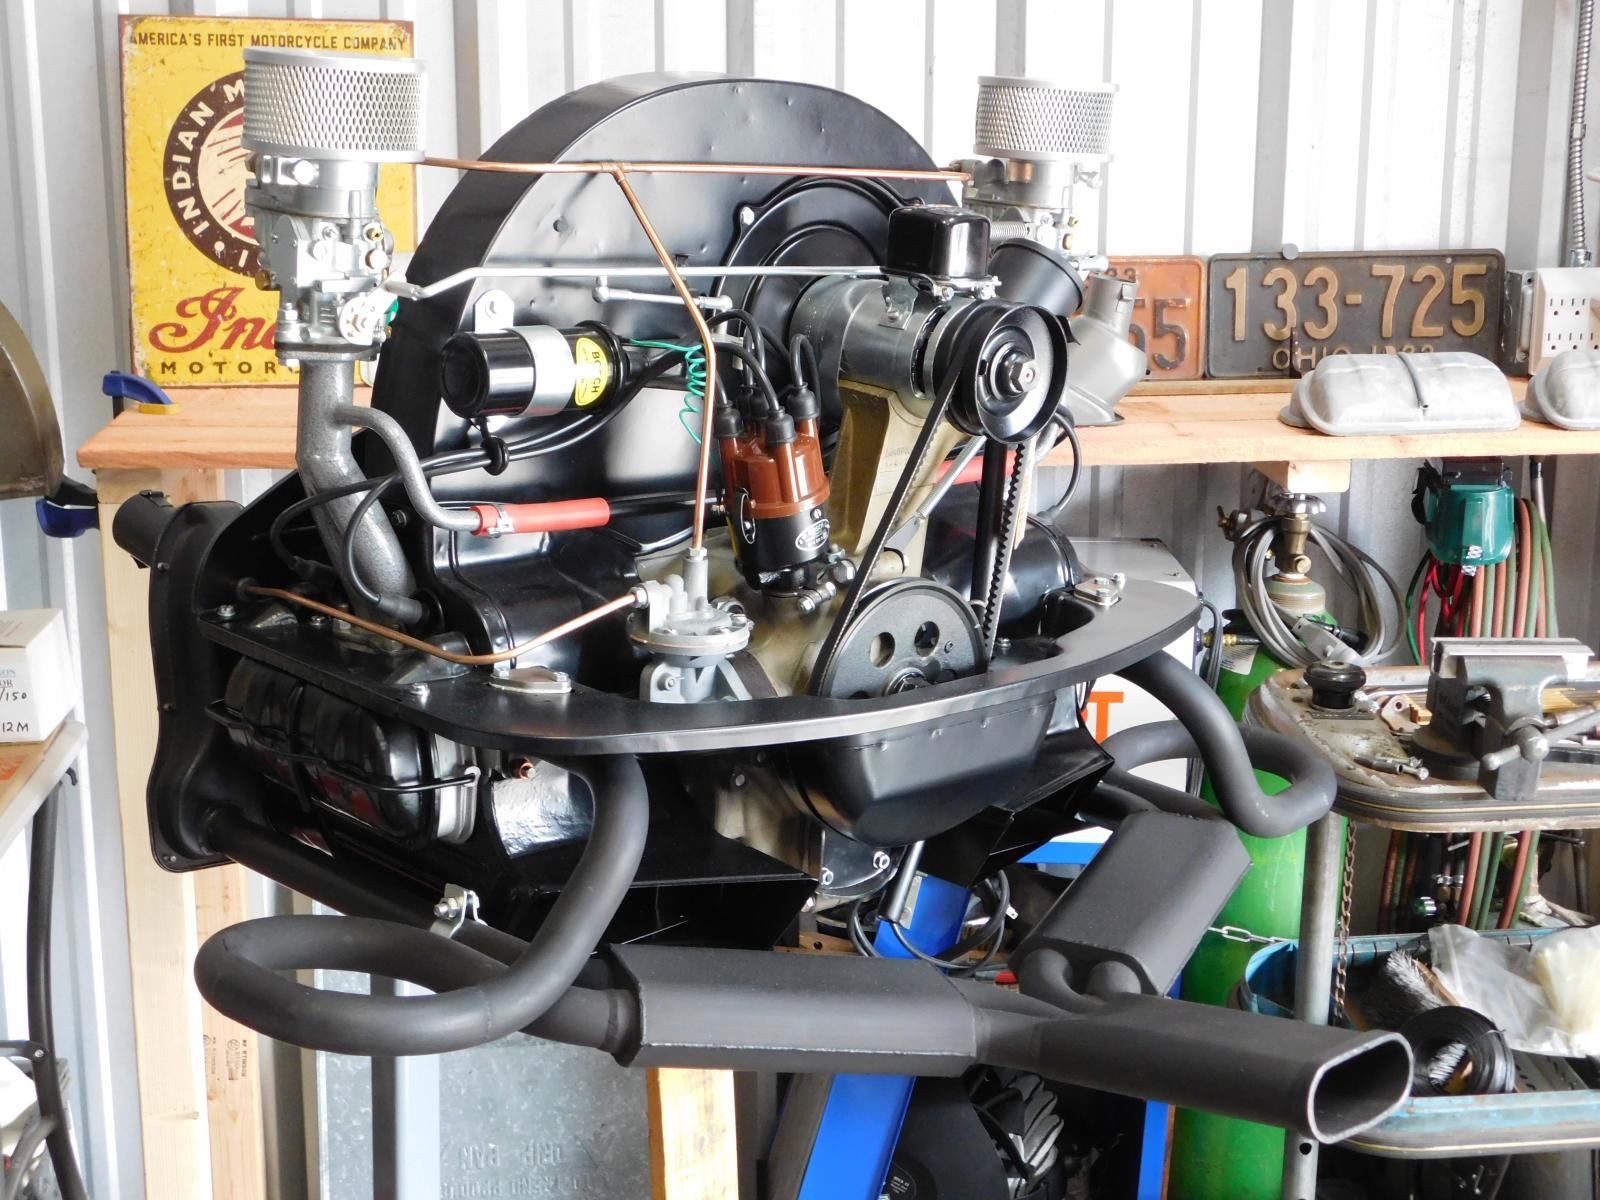 my rebuilt Okrasa engine with Ray Shubert Sebring-style header system